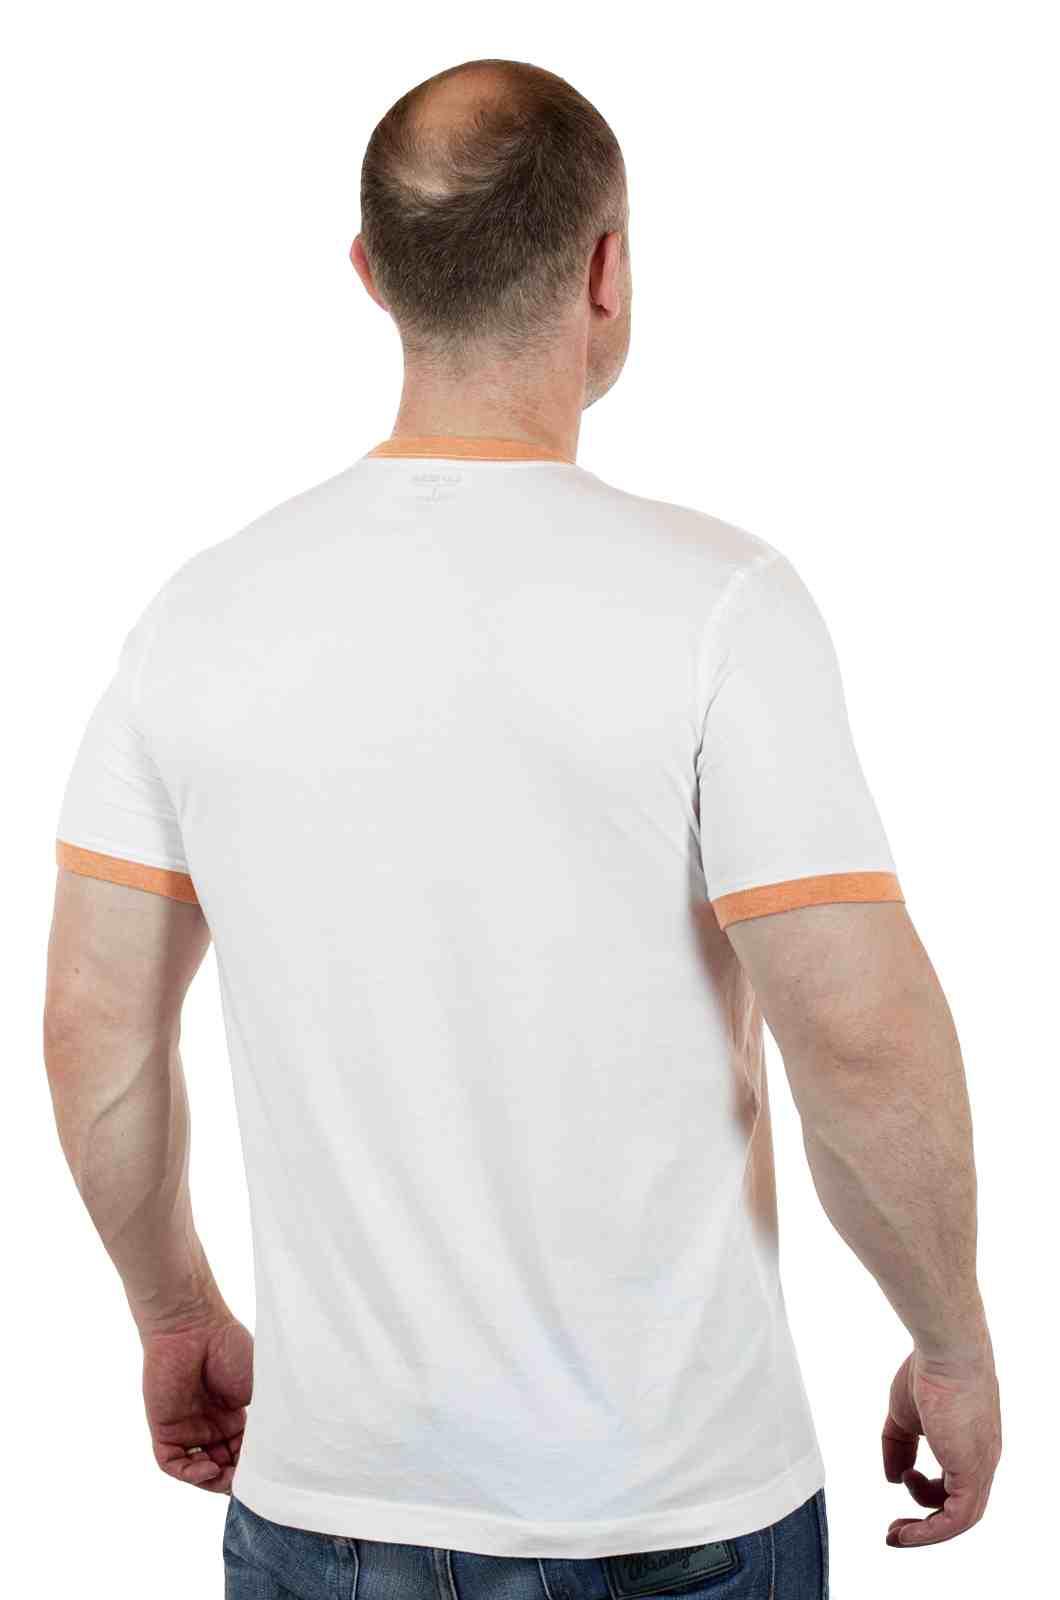 Мужская футболка Express - классика из США-сзади